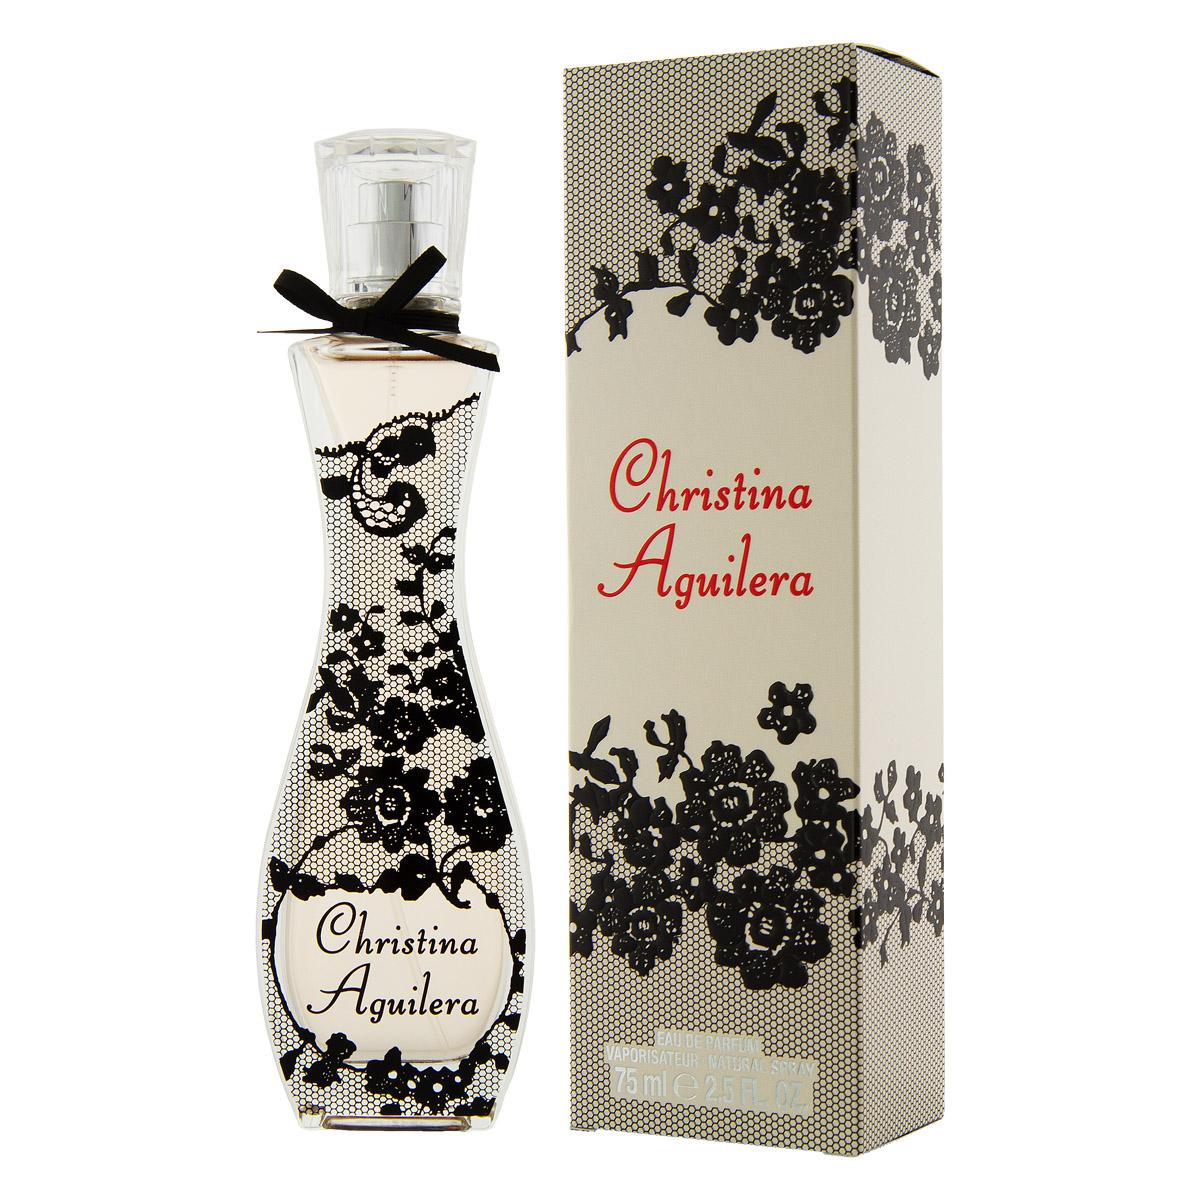 Christina Aguilera Christina Aguilera Eau De Parfum 75 ml (woman) 56535